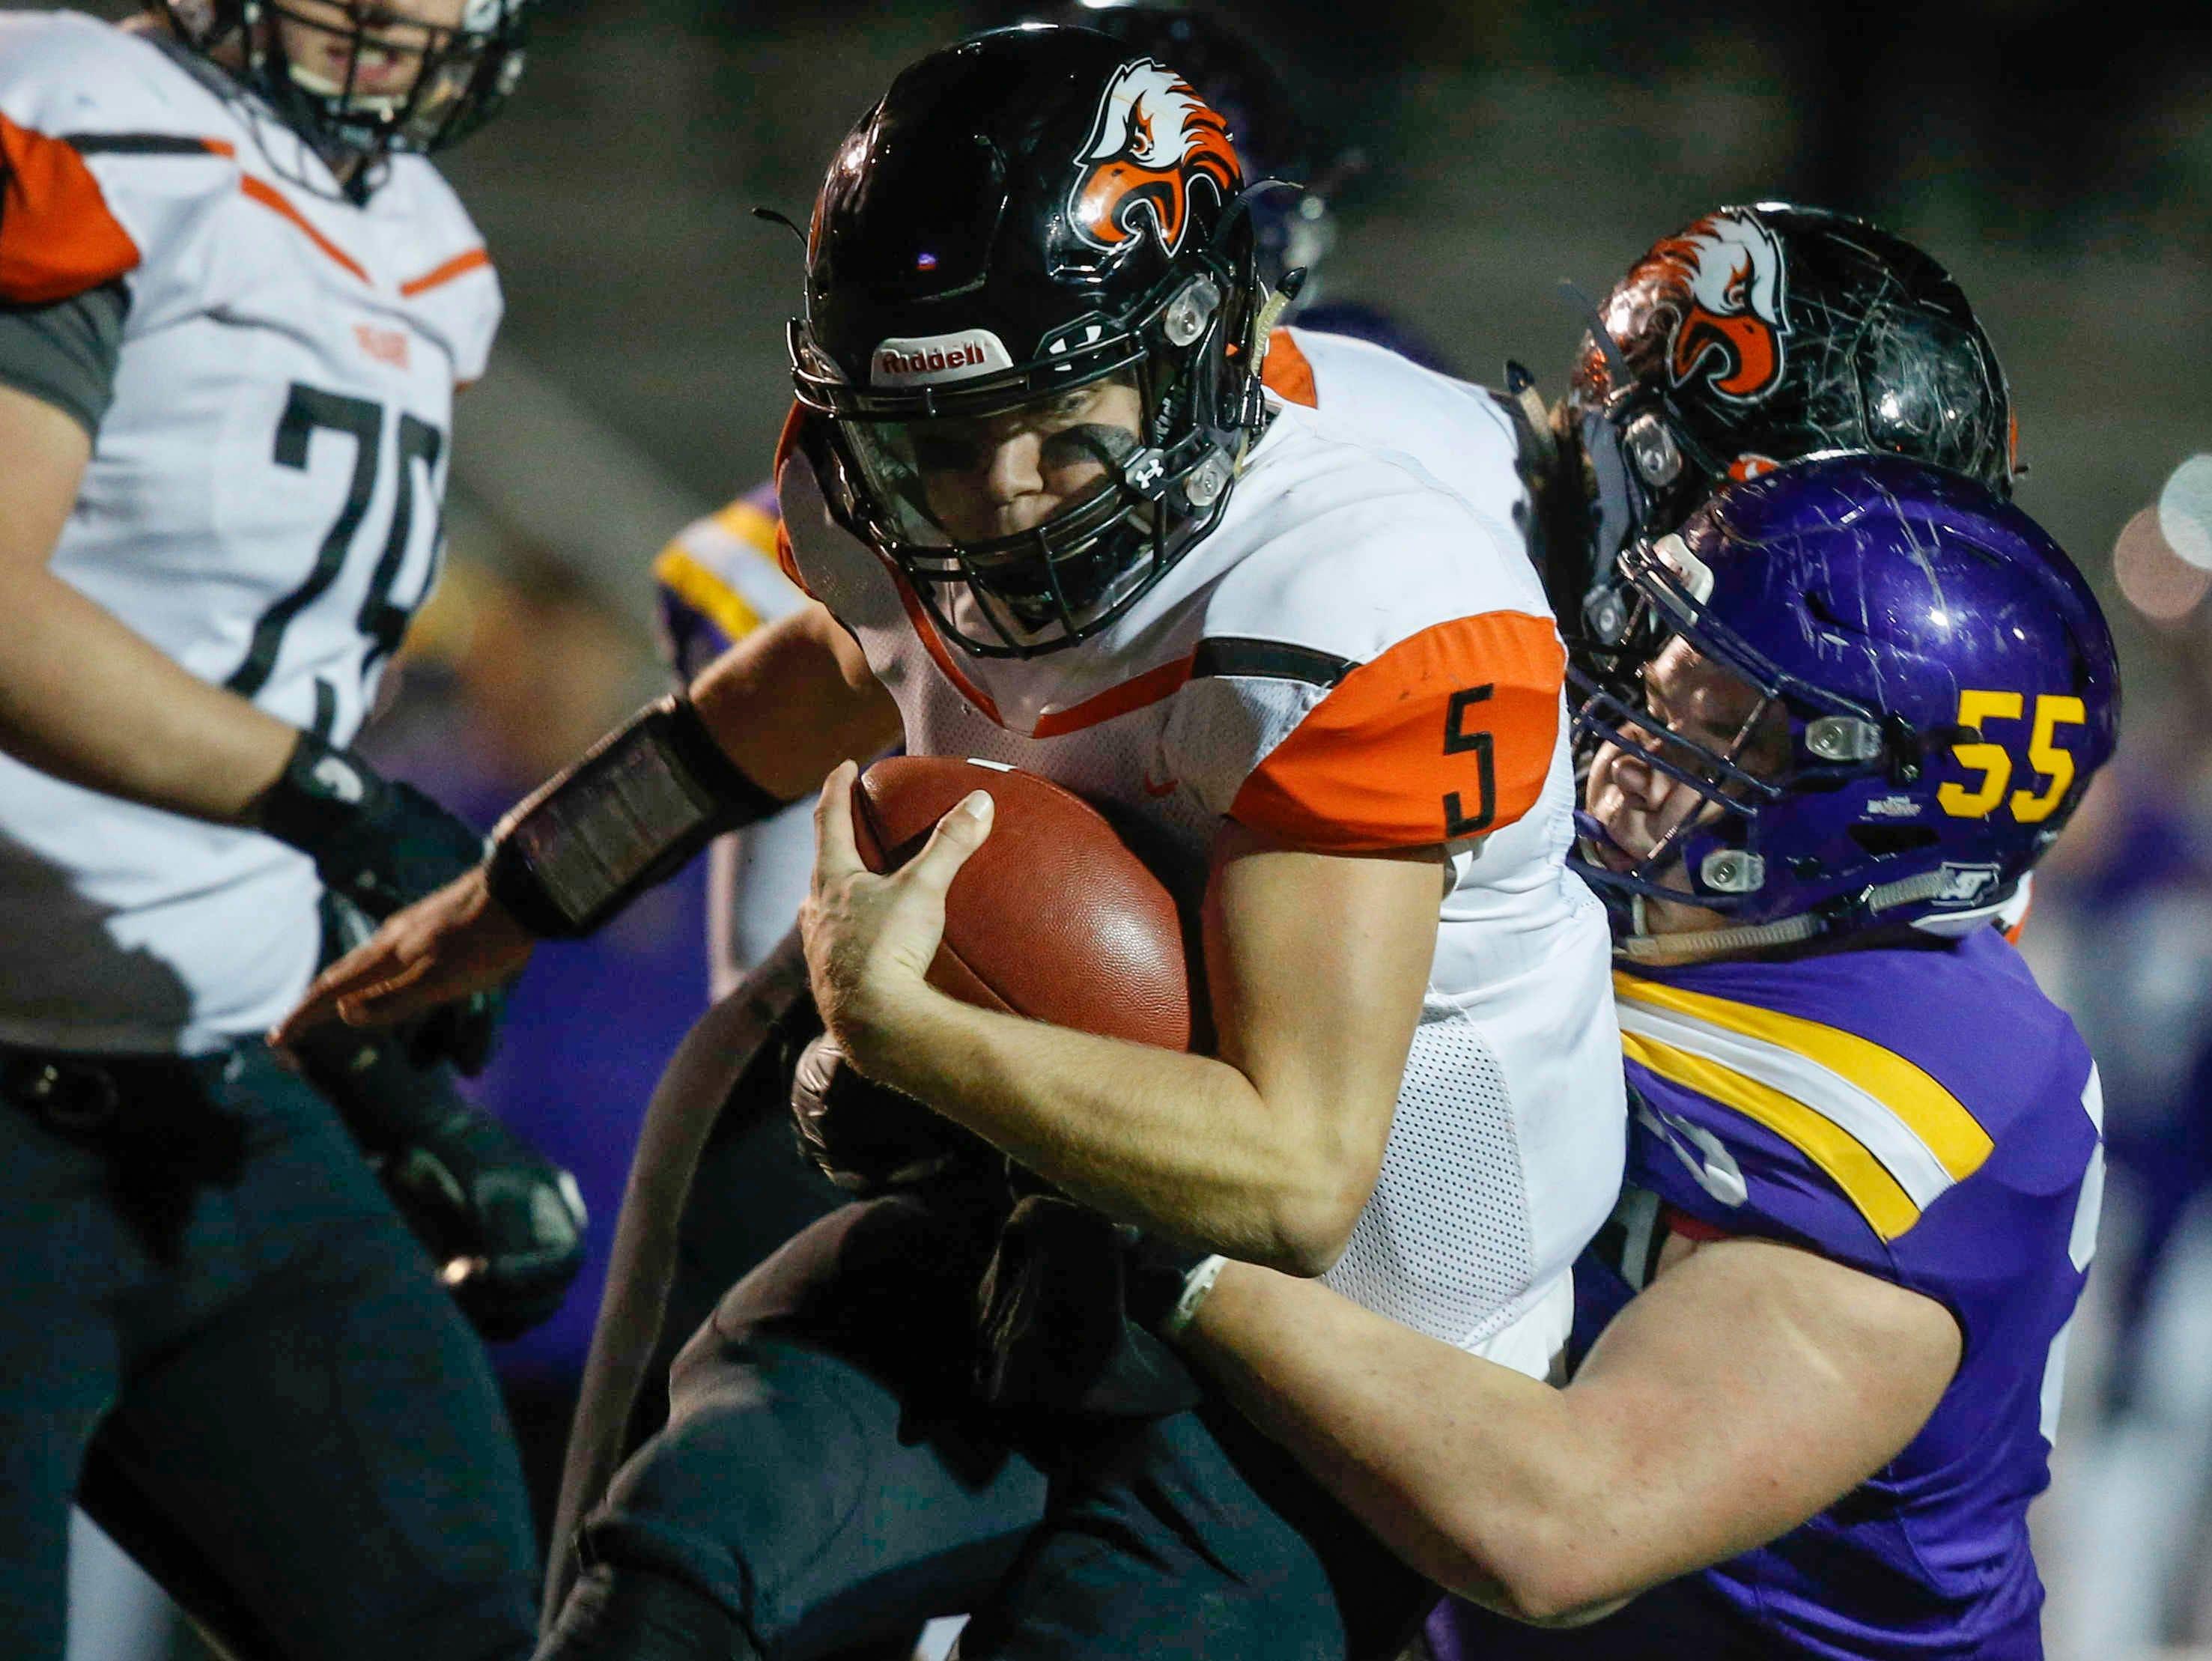 Johnston defensive lineman Brandt Howe tackles Cedar Rapids Prairie Isaak Lindgren during the first round of Iowa high school football playoffs on Friday, Oct. 26, 2018.